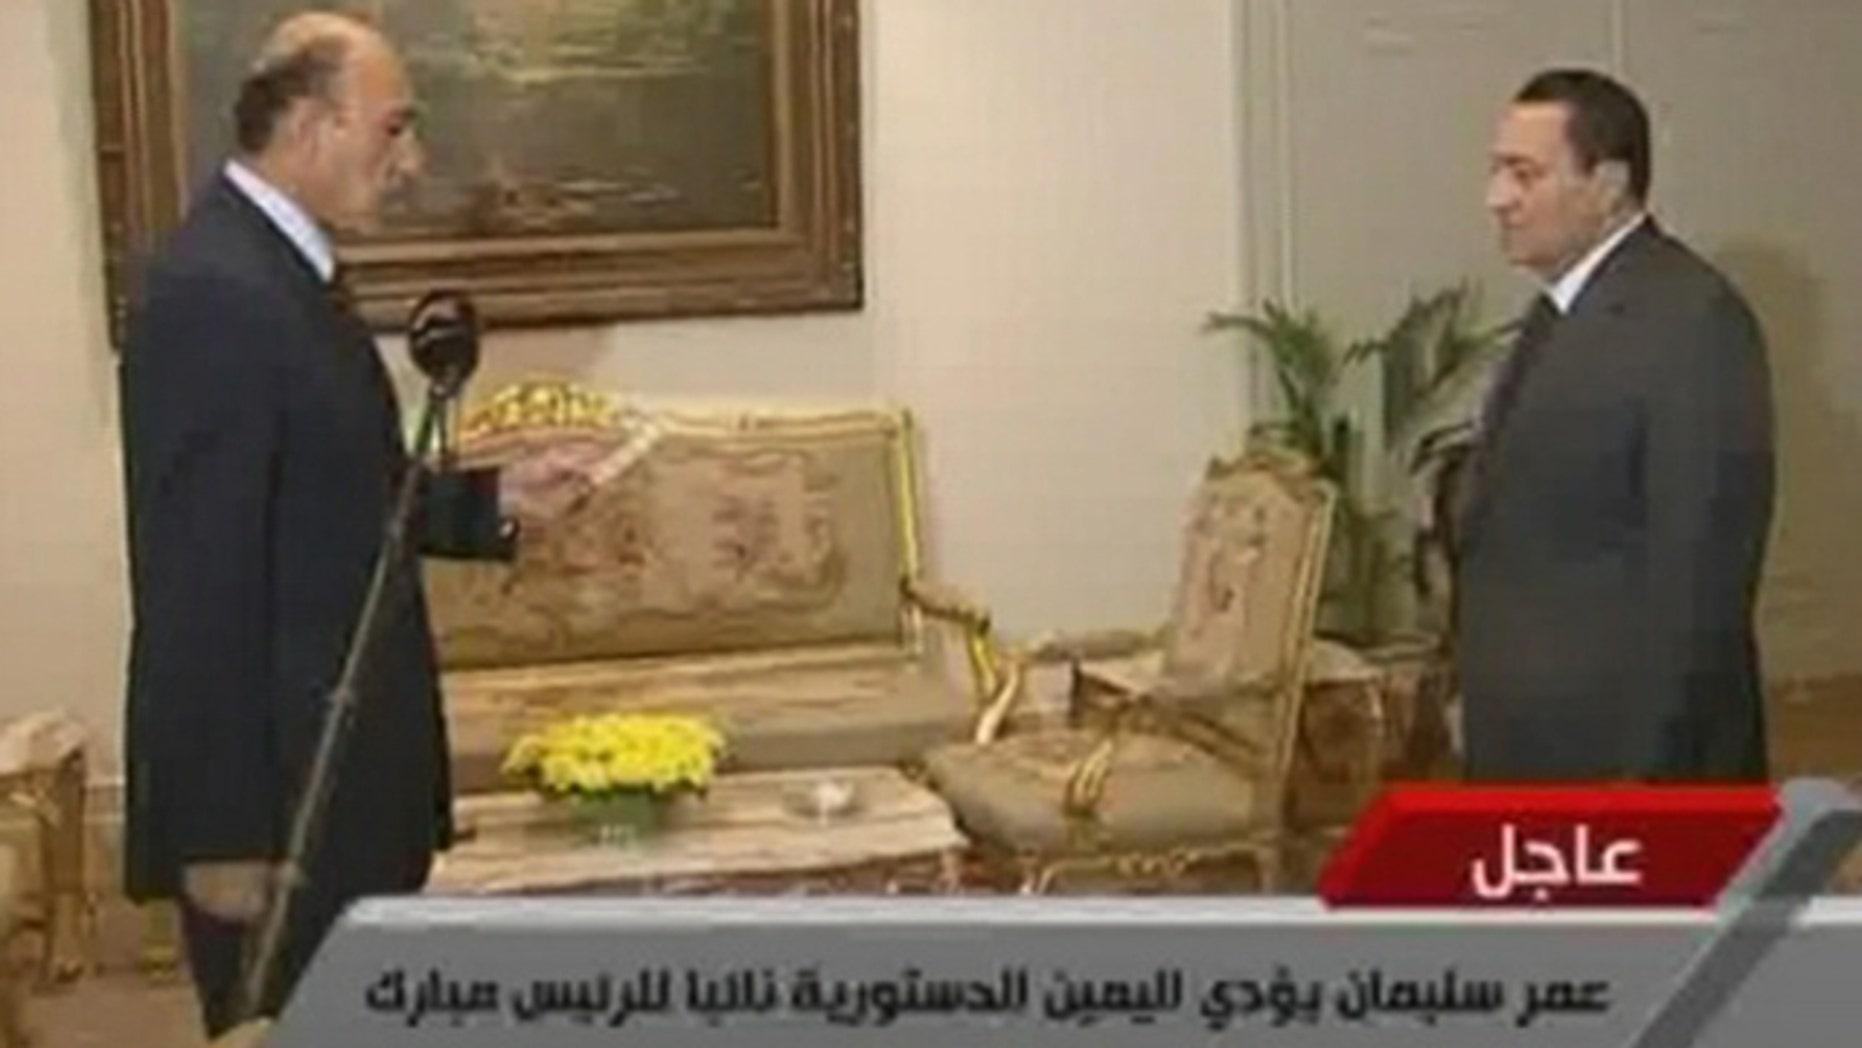 Jan. 29: In this image taken from TV, Egyptian President Hosni Mubarak, right, listens as Omar Suleiman swears the oath as Vice President of Egypt.